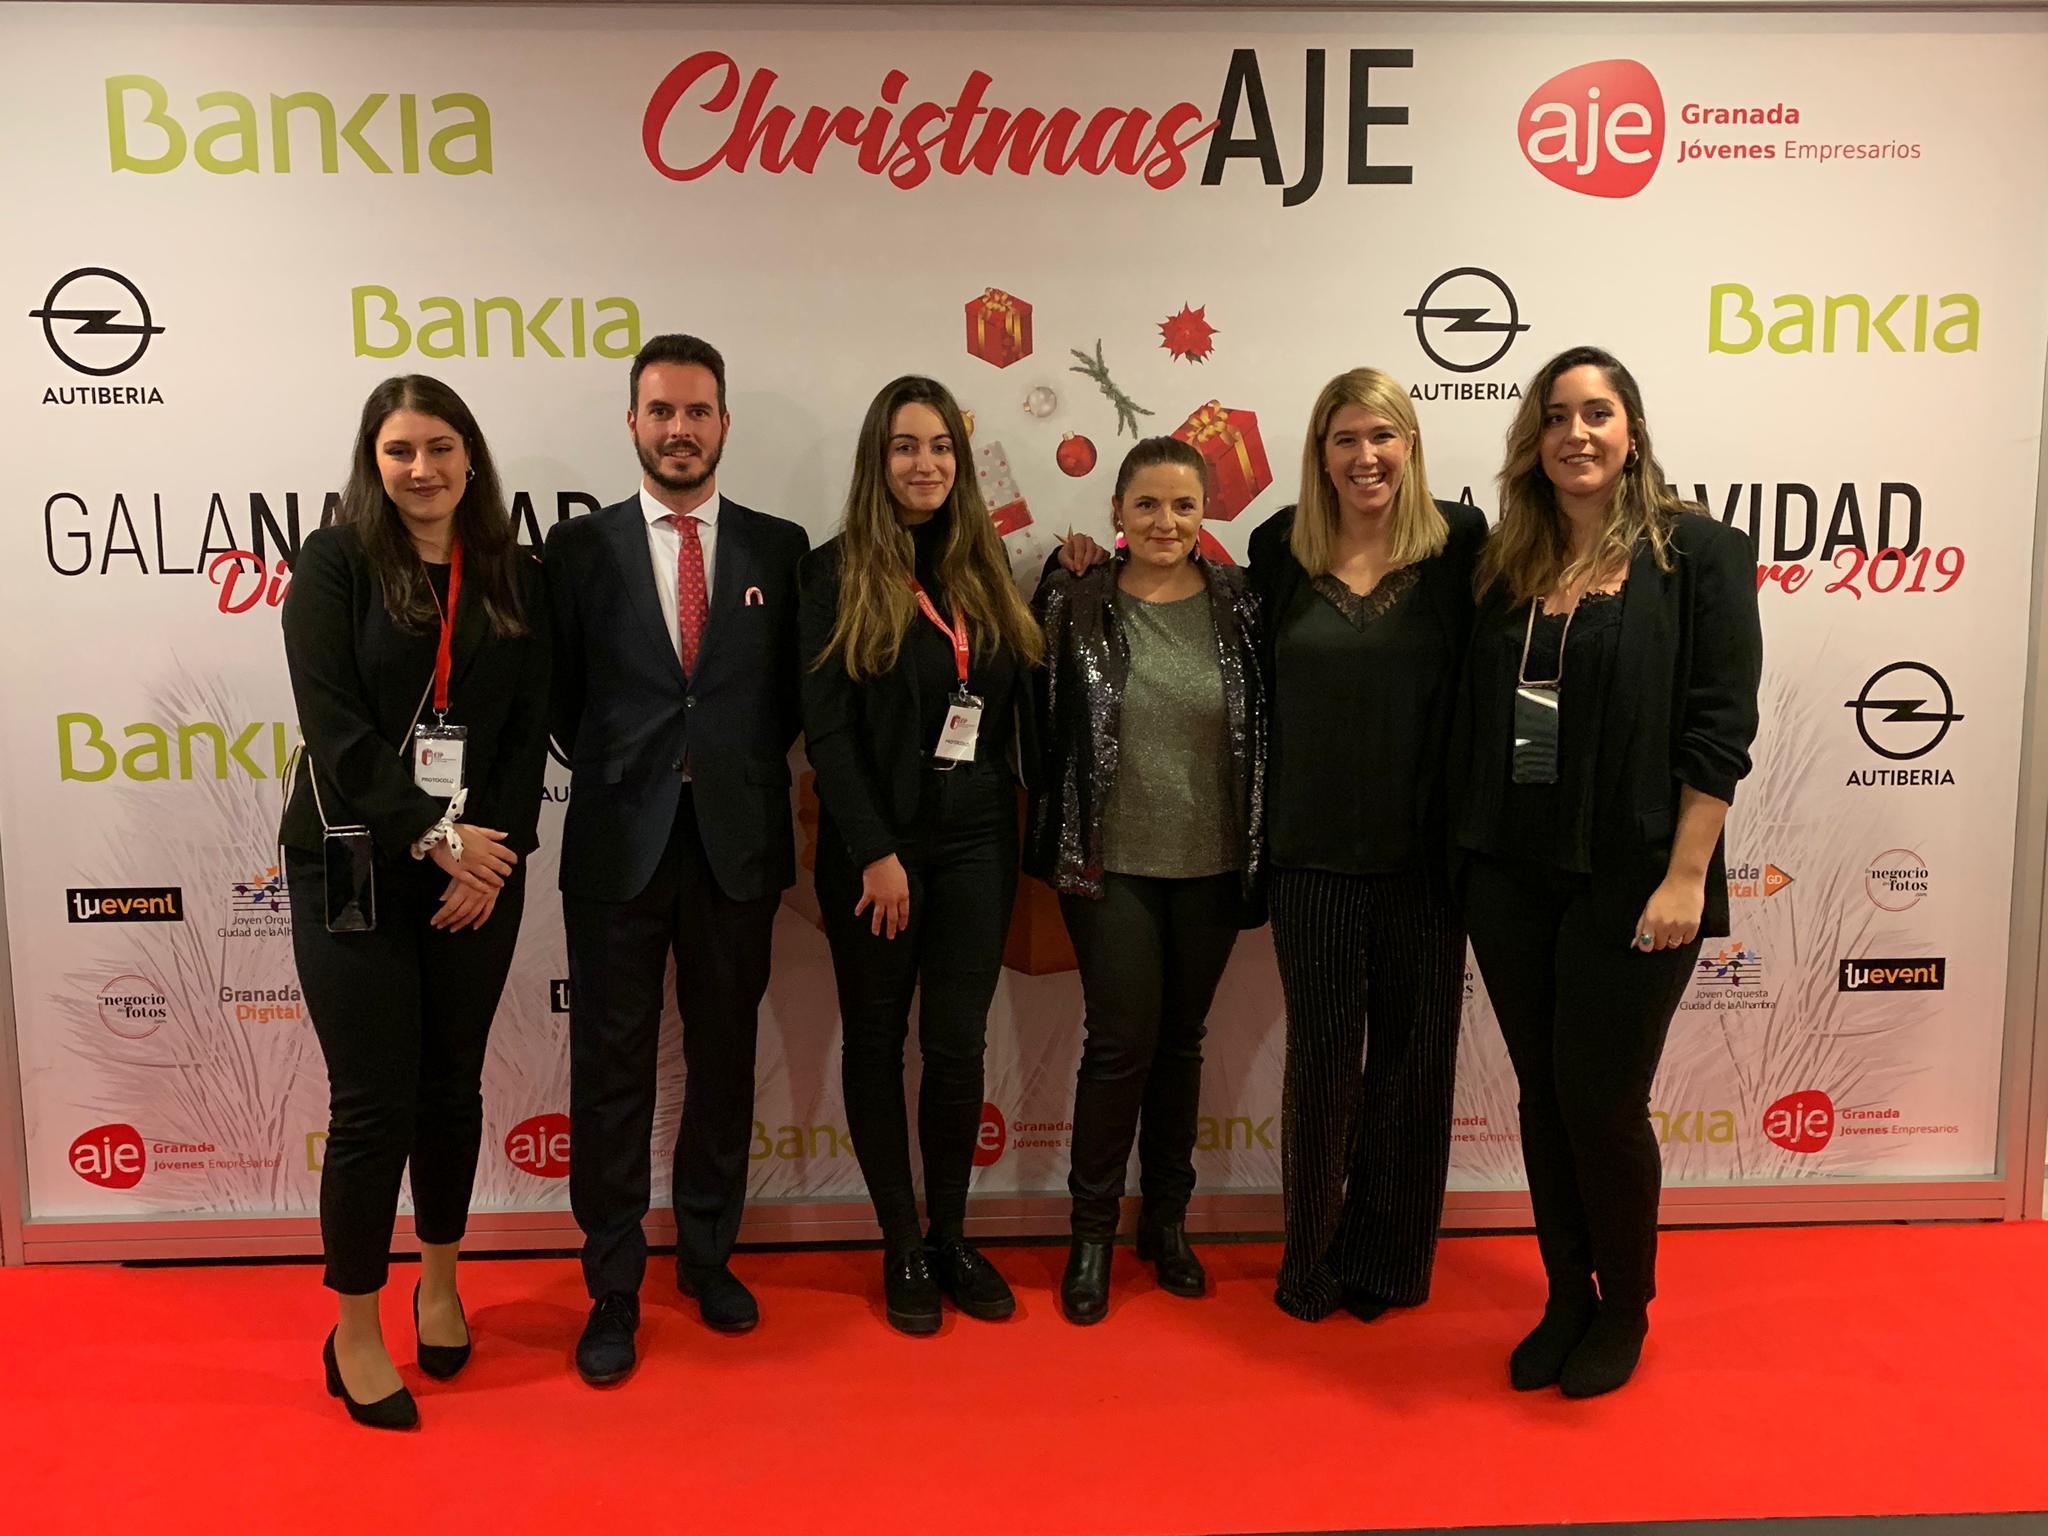 Asistimos a la Gala CHRISTMAS AJE 2019 BY BANKIA